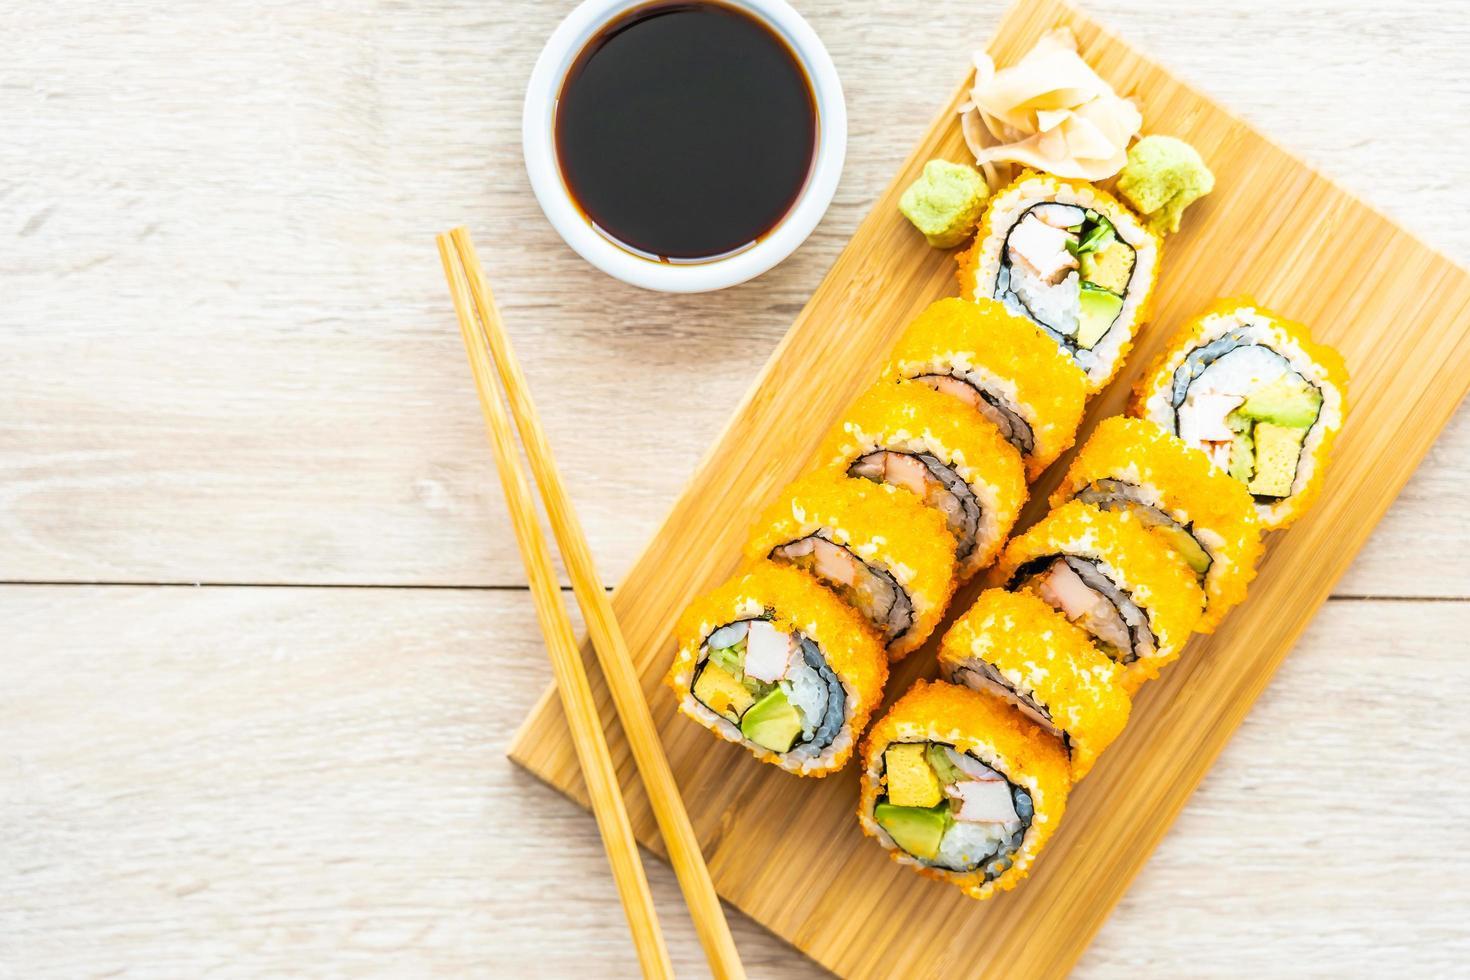 Kalifornien Maki rollt Sushi foto